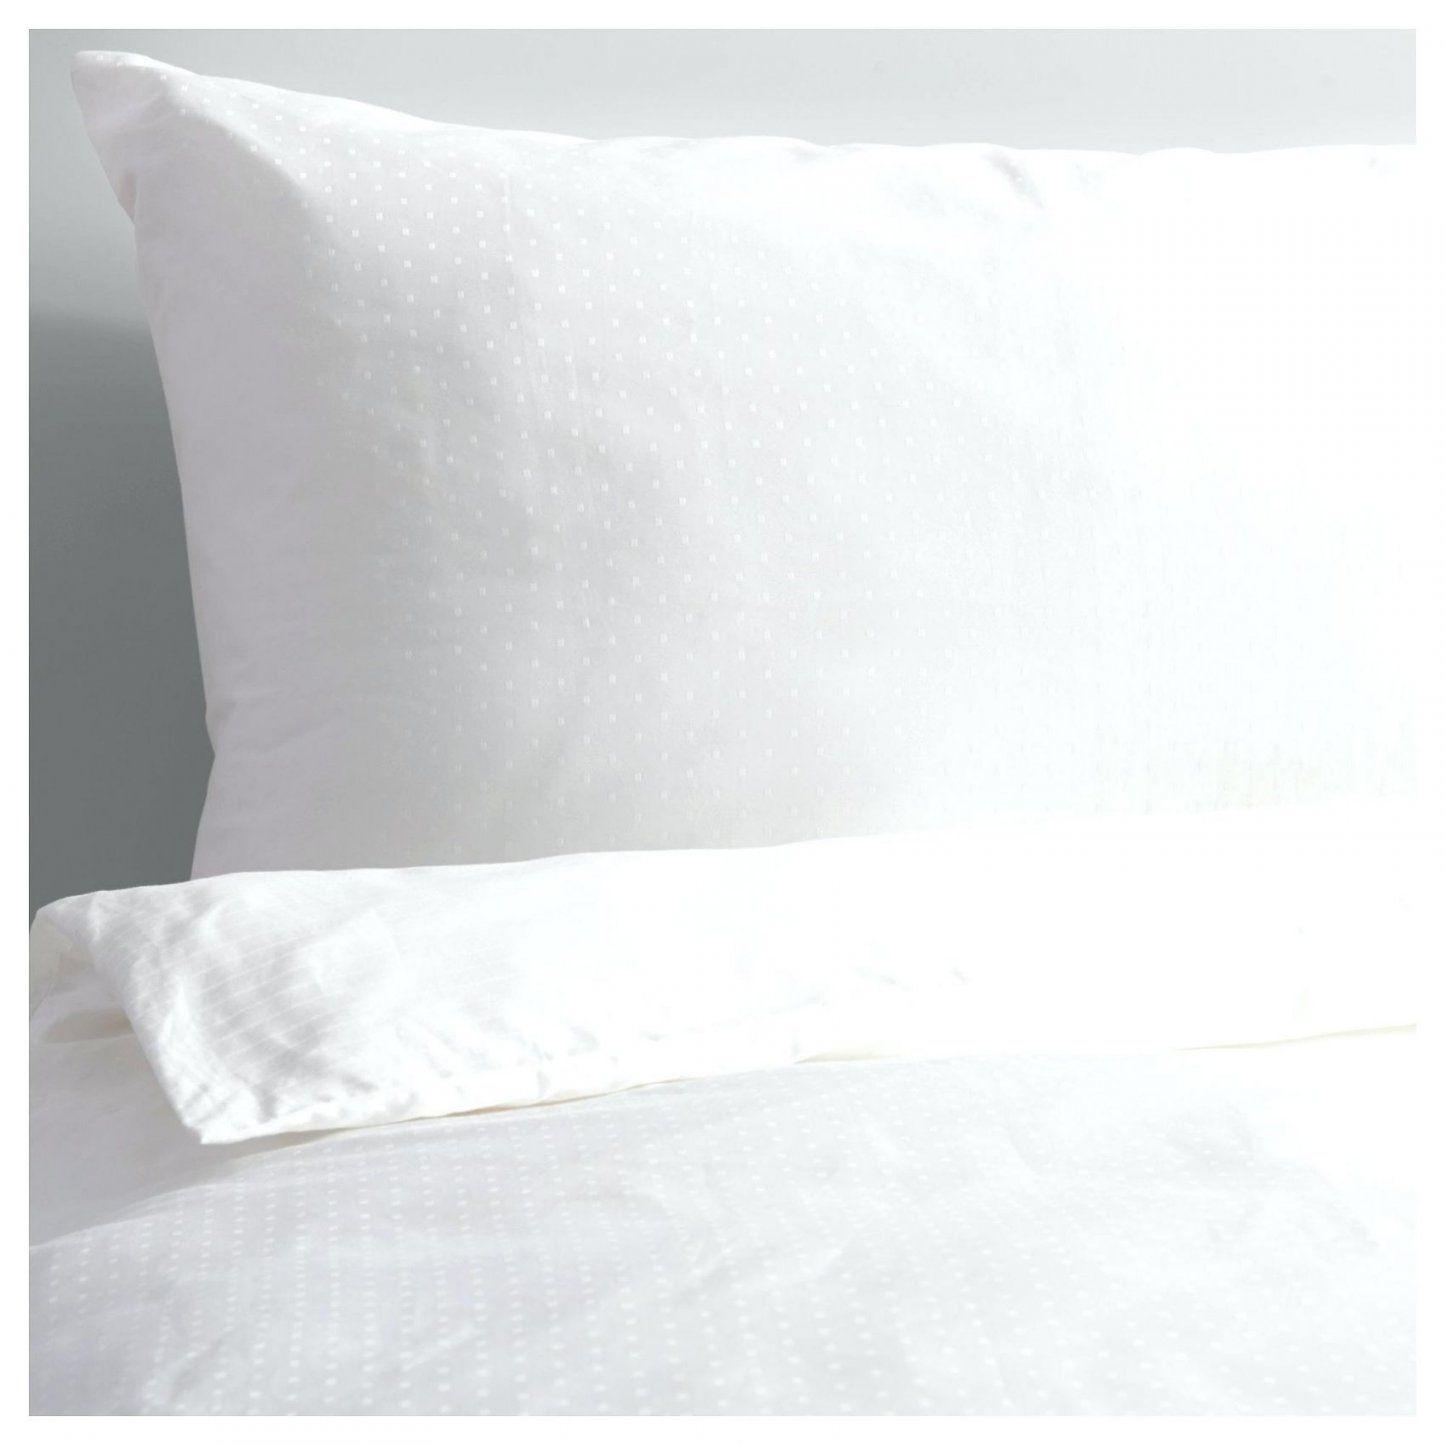 ikea bettw sche 135x200 haus design ideen. Black Bedroom Furniture Sets. Home Design Ideas